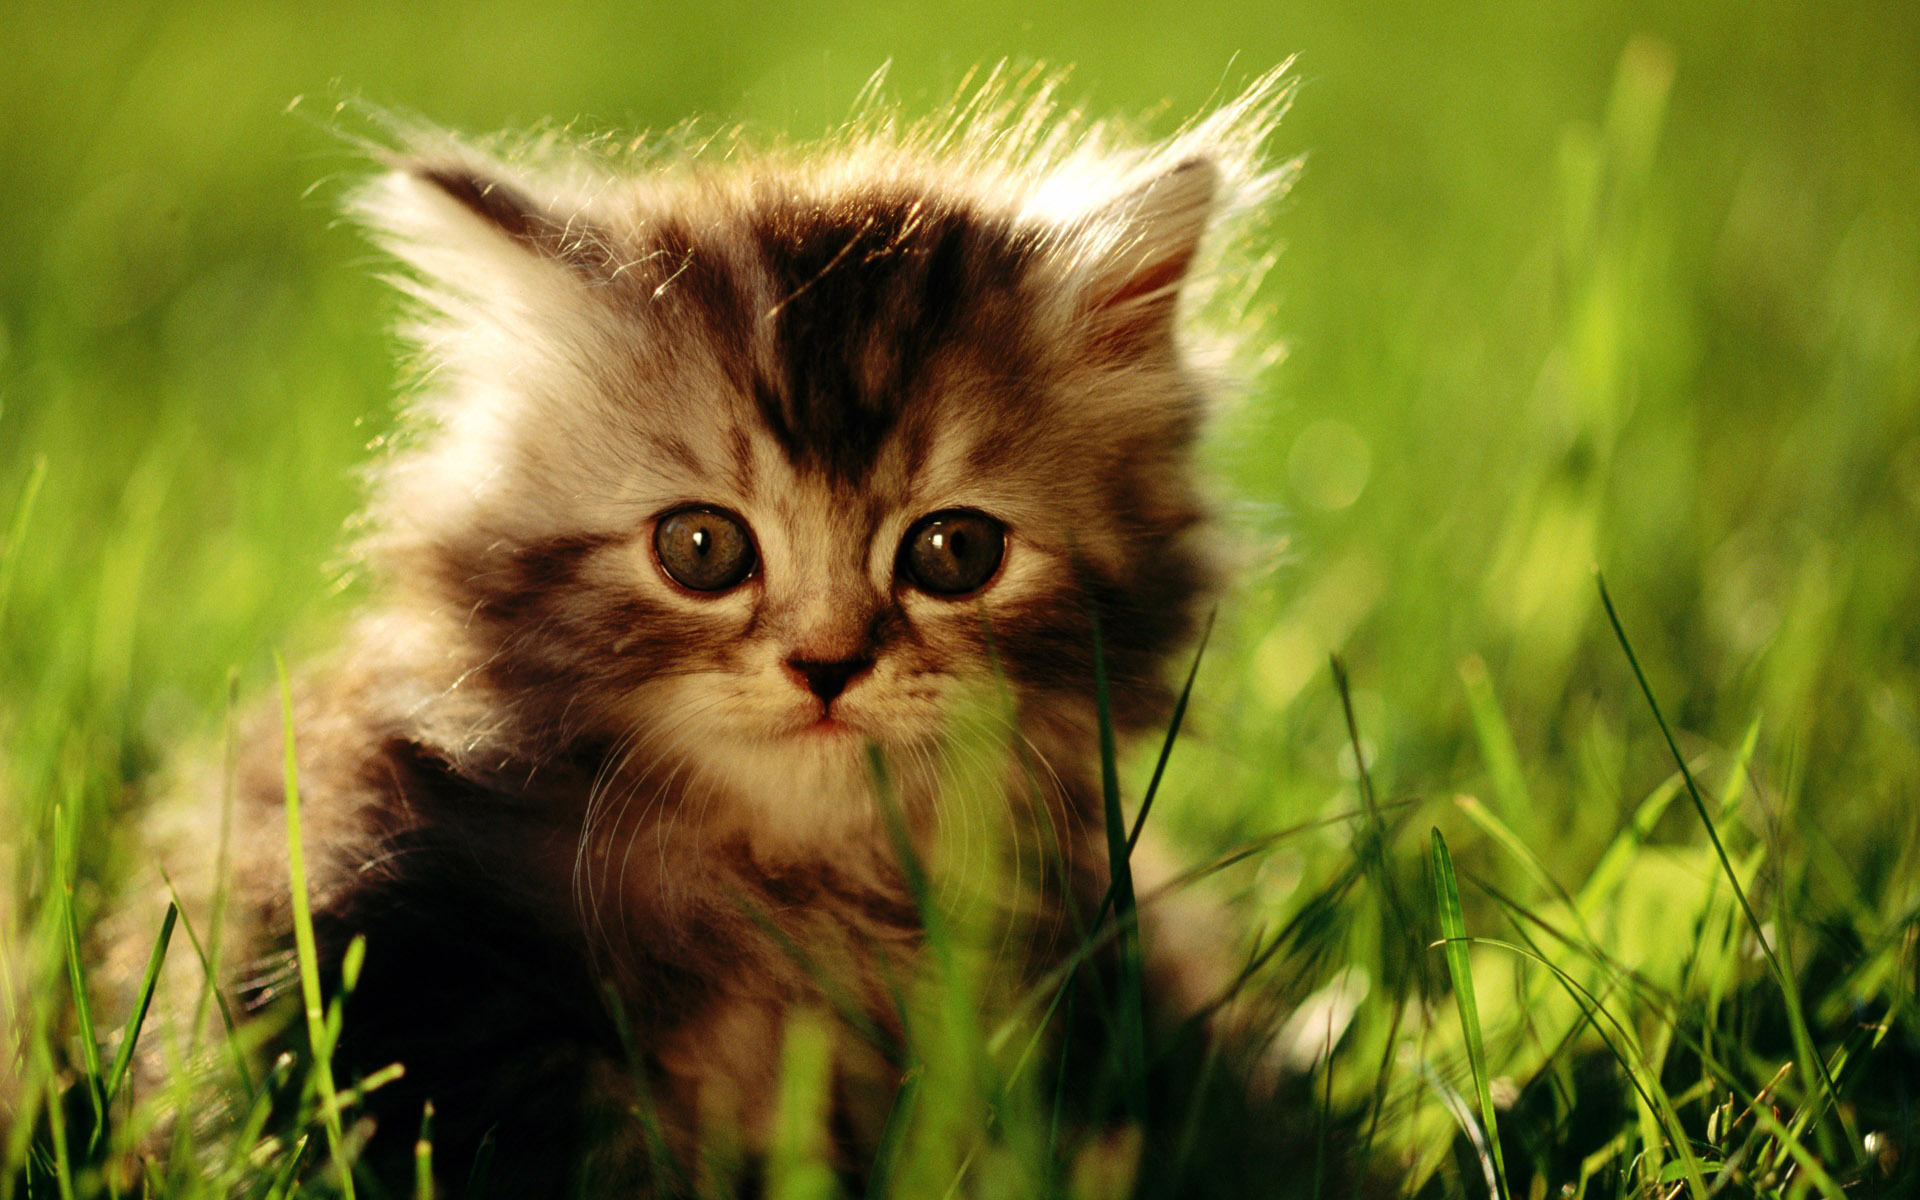 Wonderful Cat Wallpaper 1920x1200 - 156368  Image_1002953 .jpg